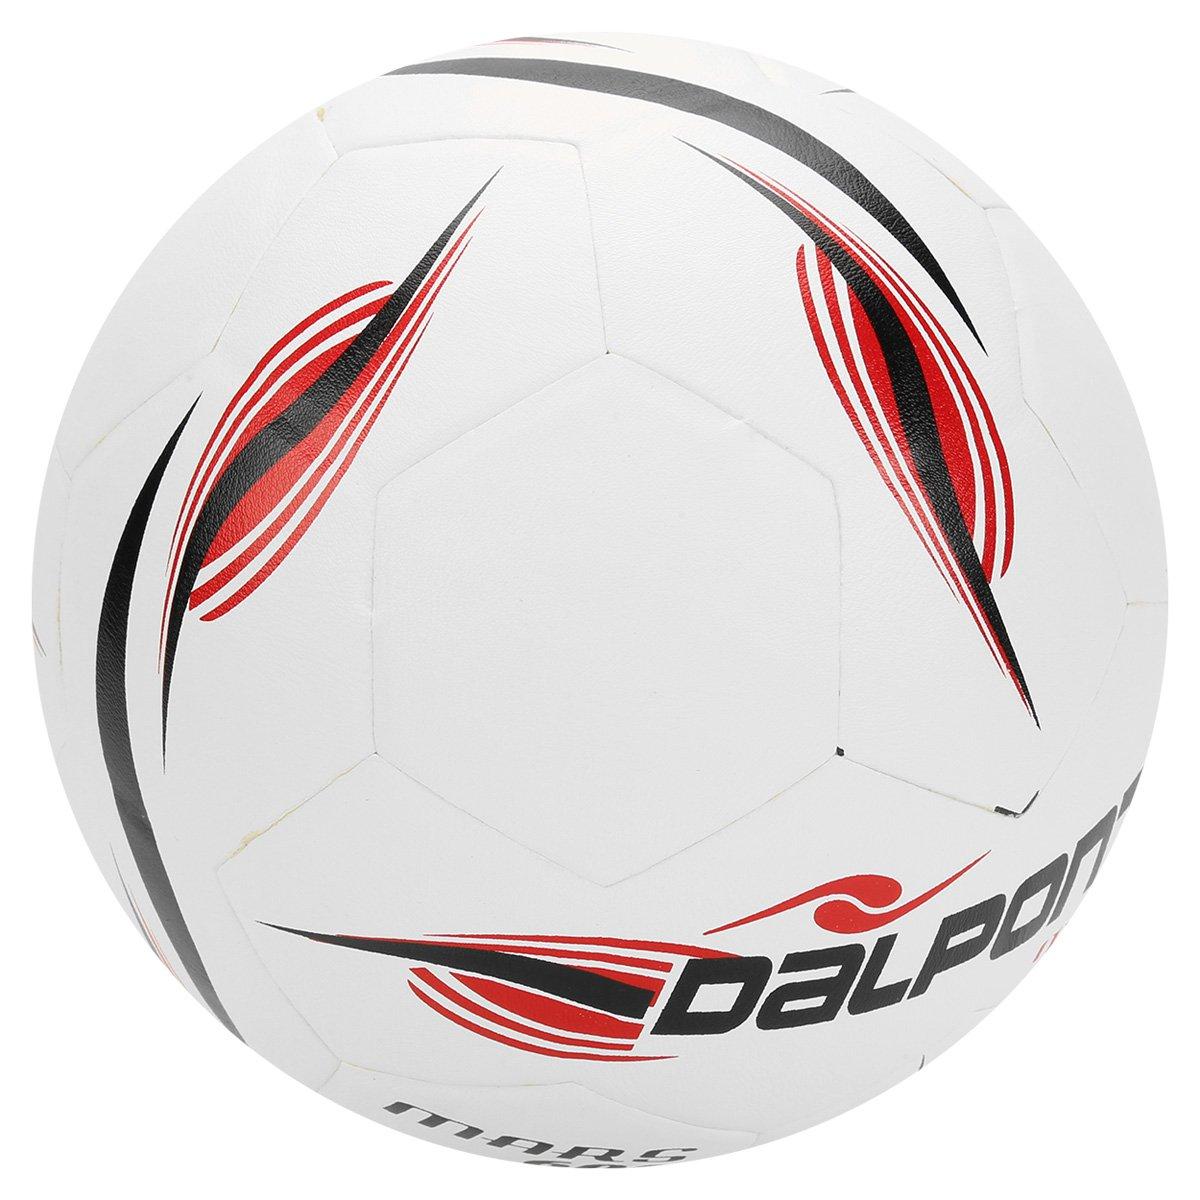 4415599d80 Bola Futebol Dalponte Mars 600 Futsal - Compre Agora